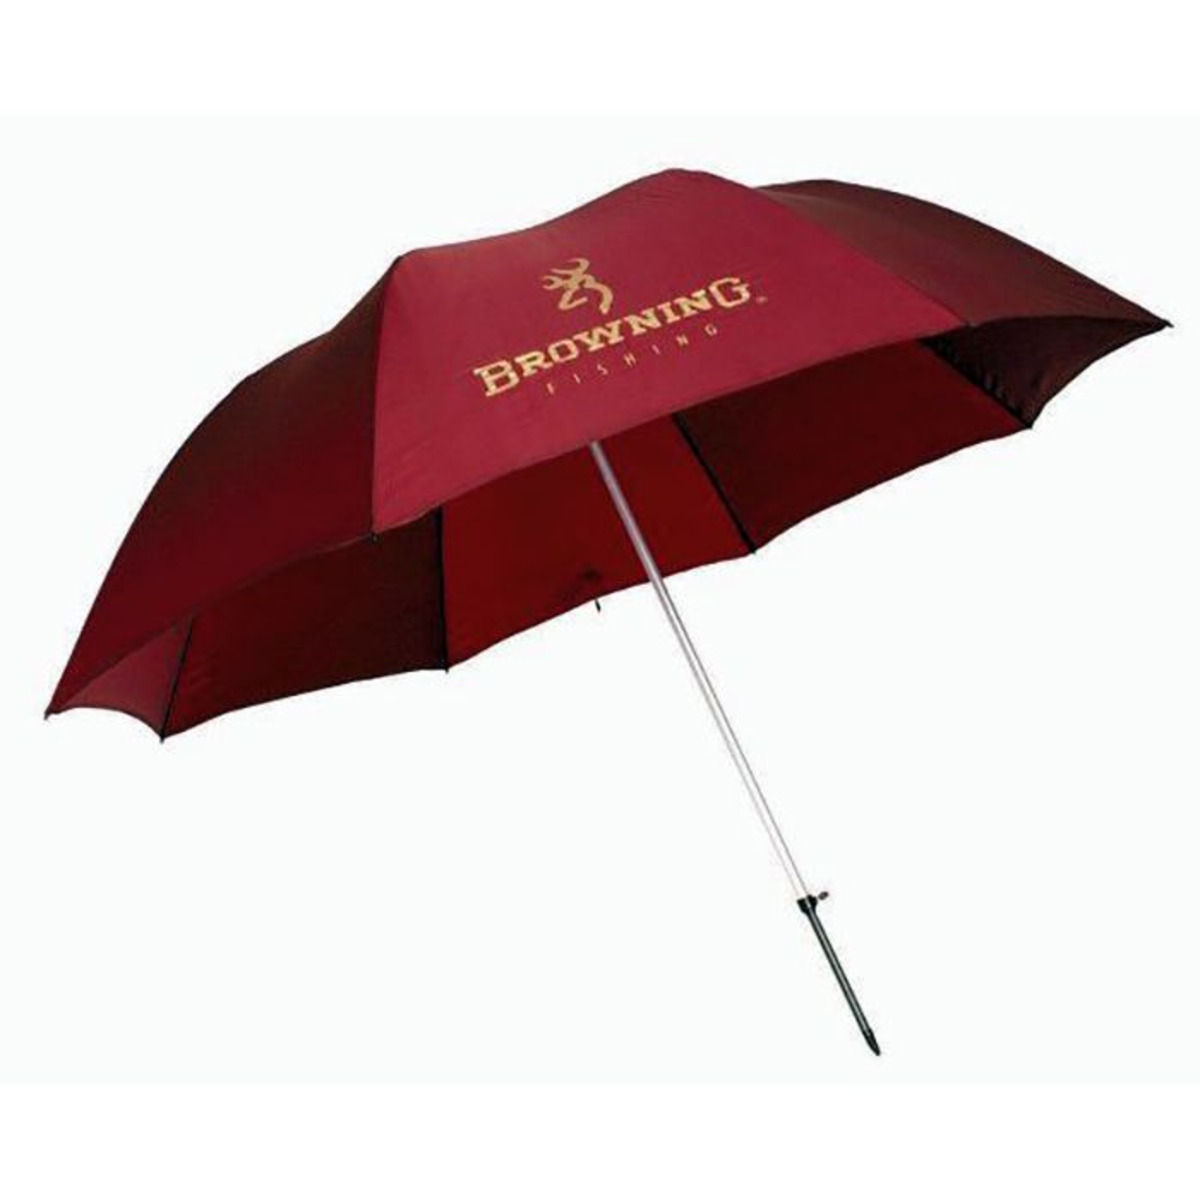 Browning Xitan Mega Match Umbrella - Durchmesser 3 m